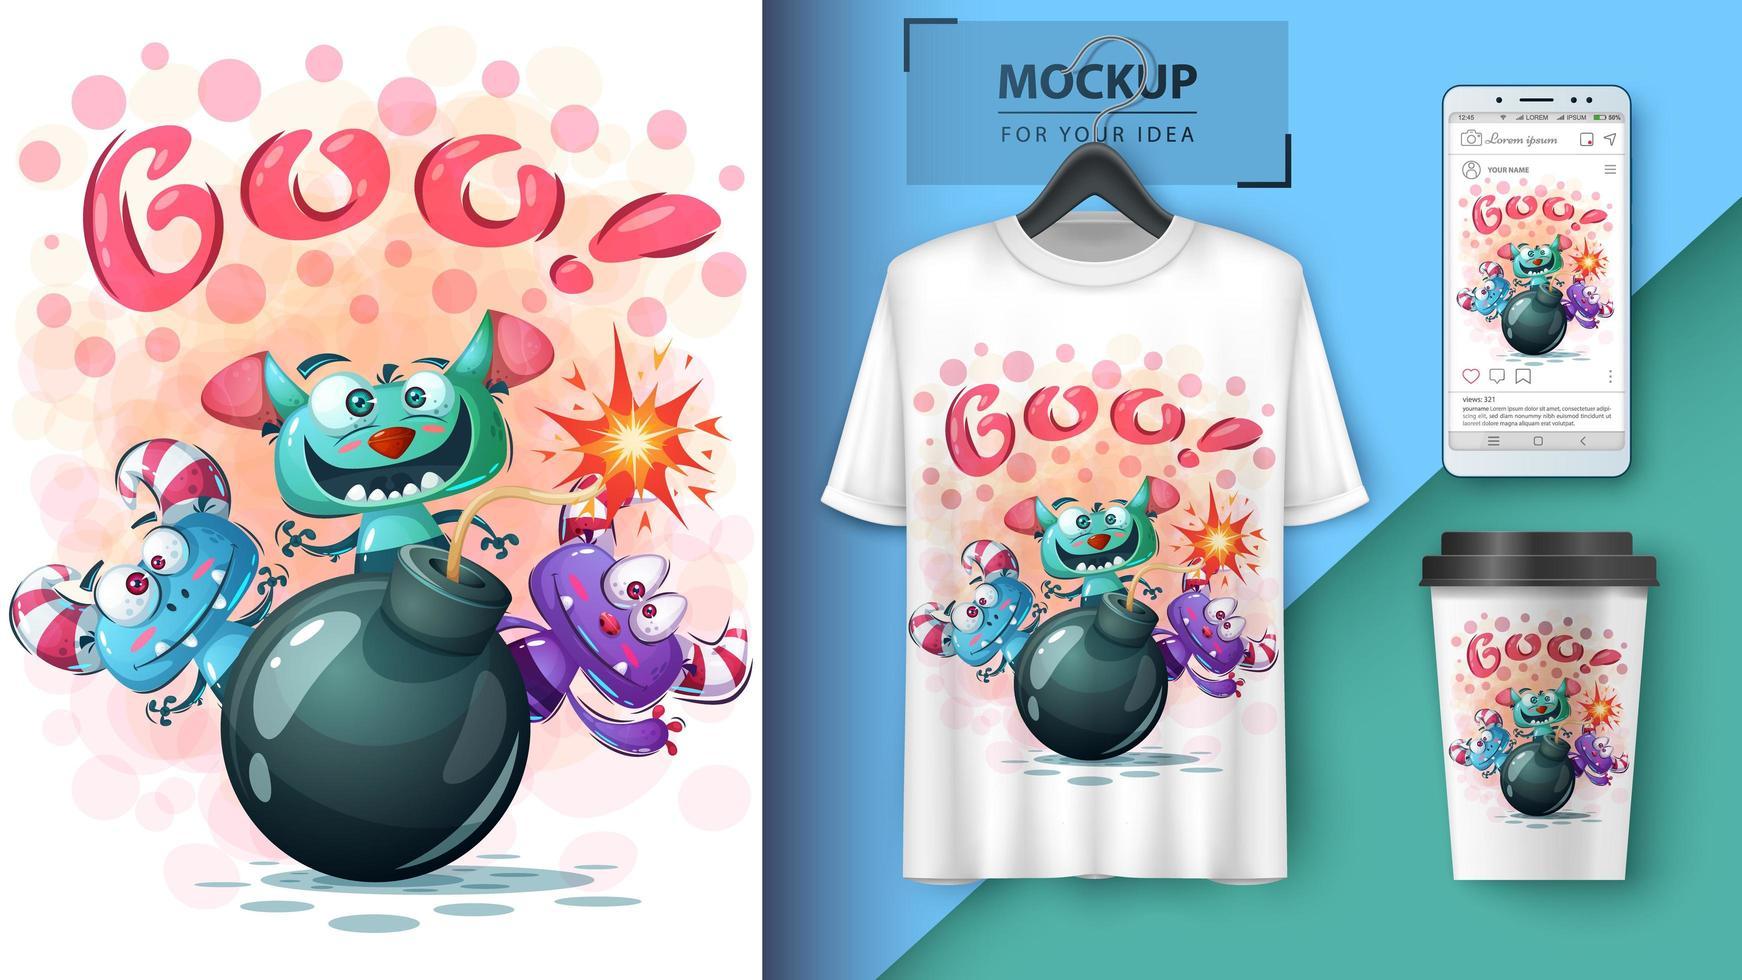 Cartoon Monsters Boo Poster  vector